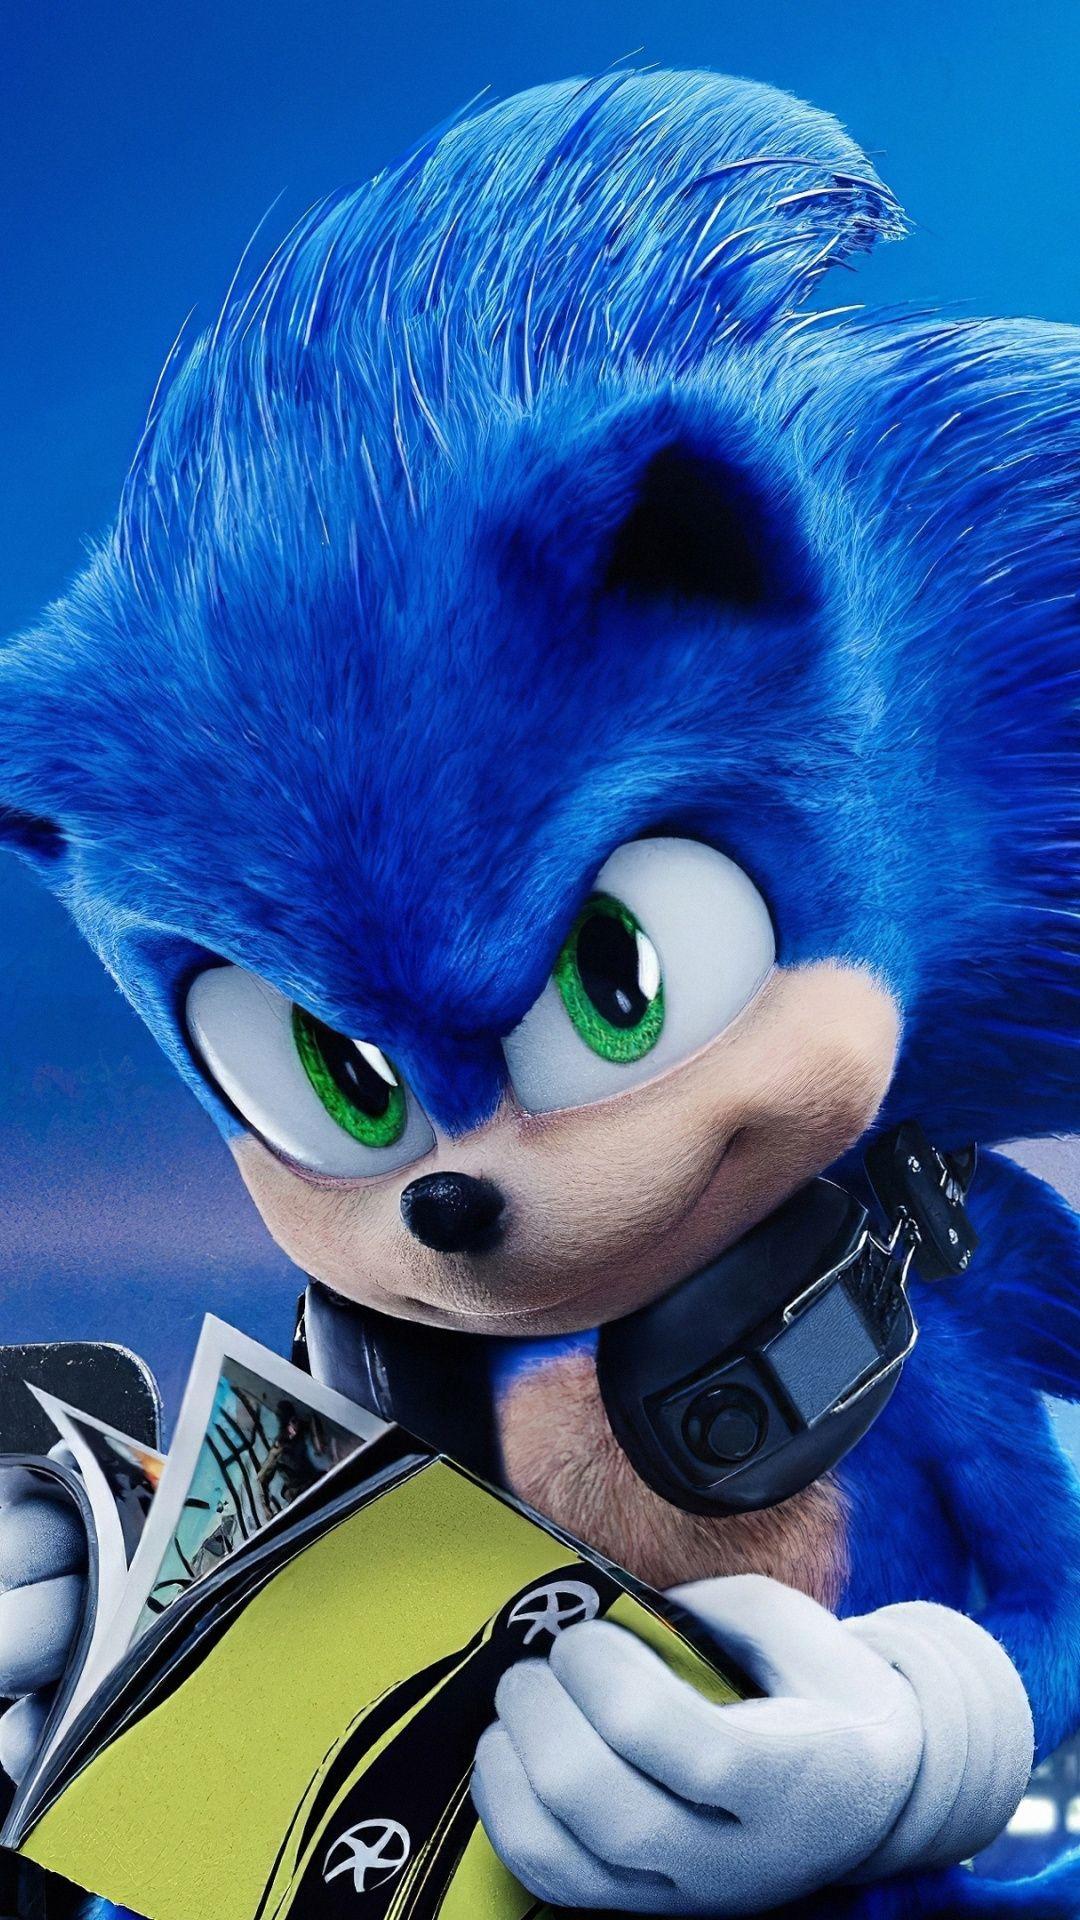 1080x1920 Sonic The Hedgehog 2020 movie wallpaper Movie 1080x1920